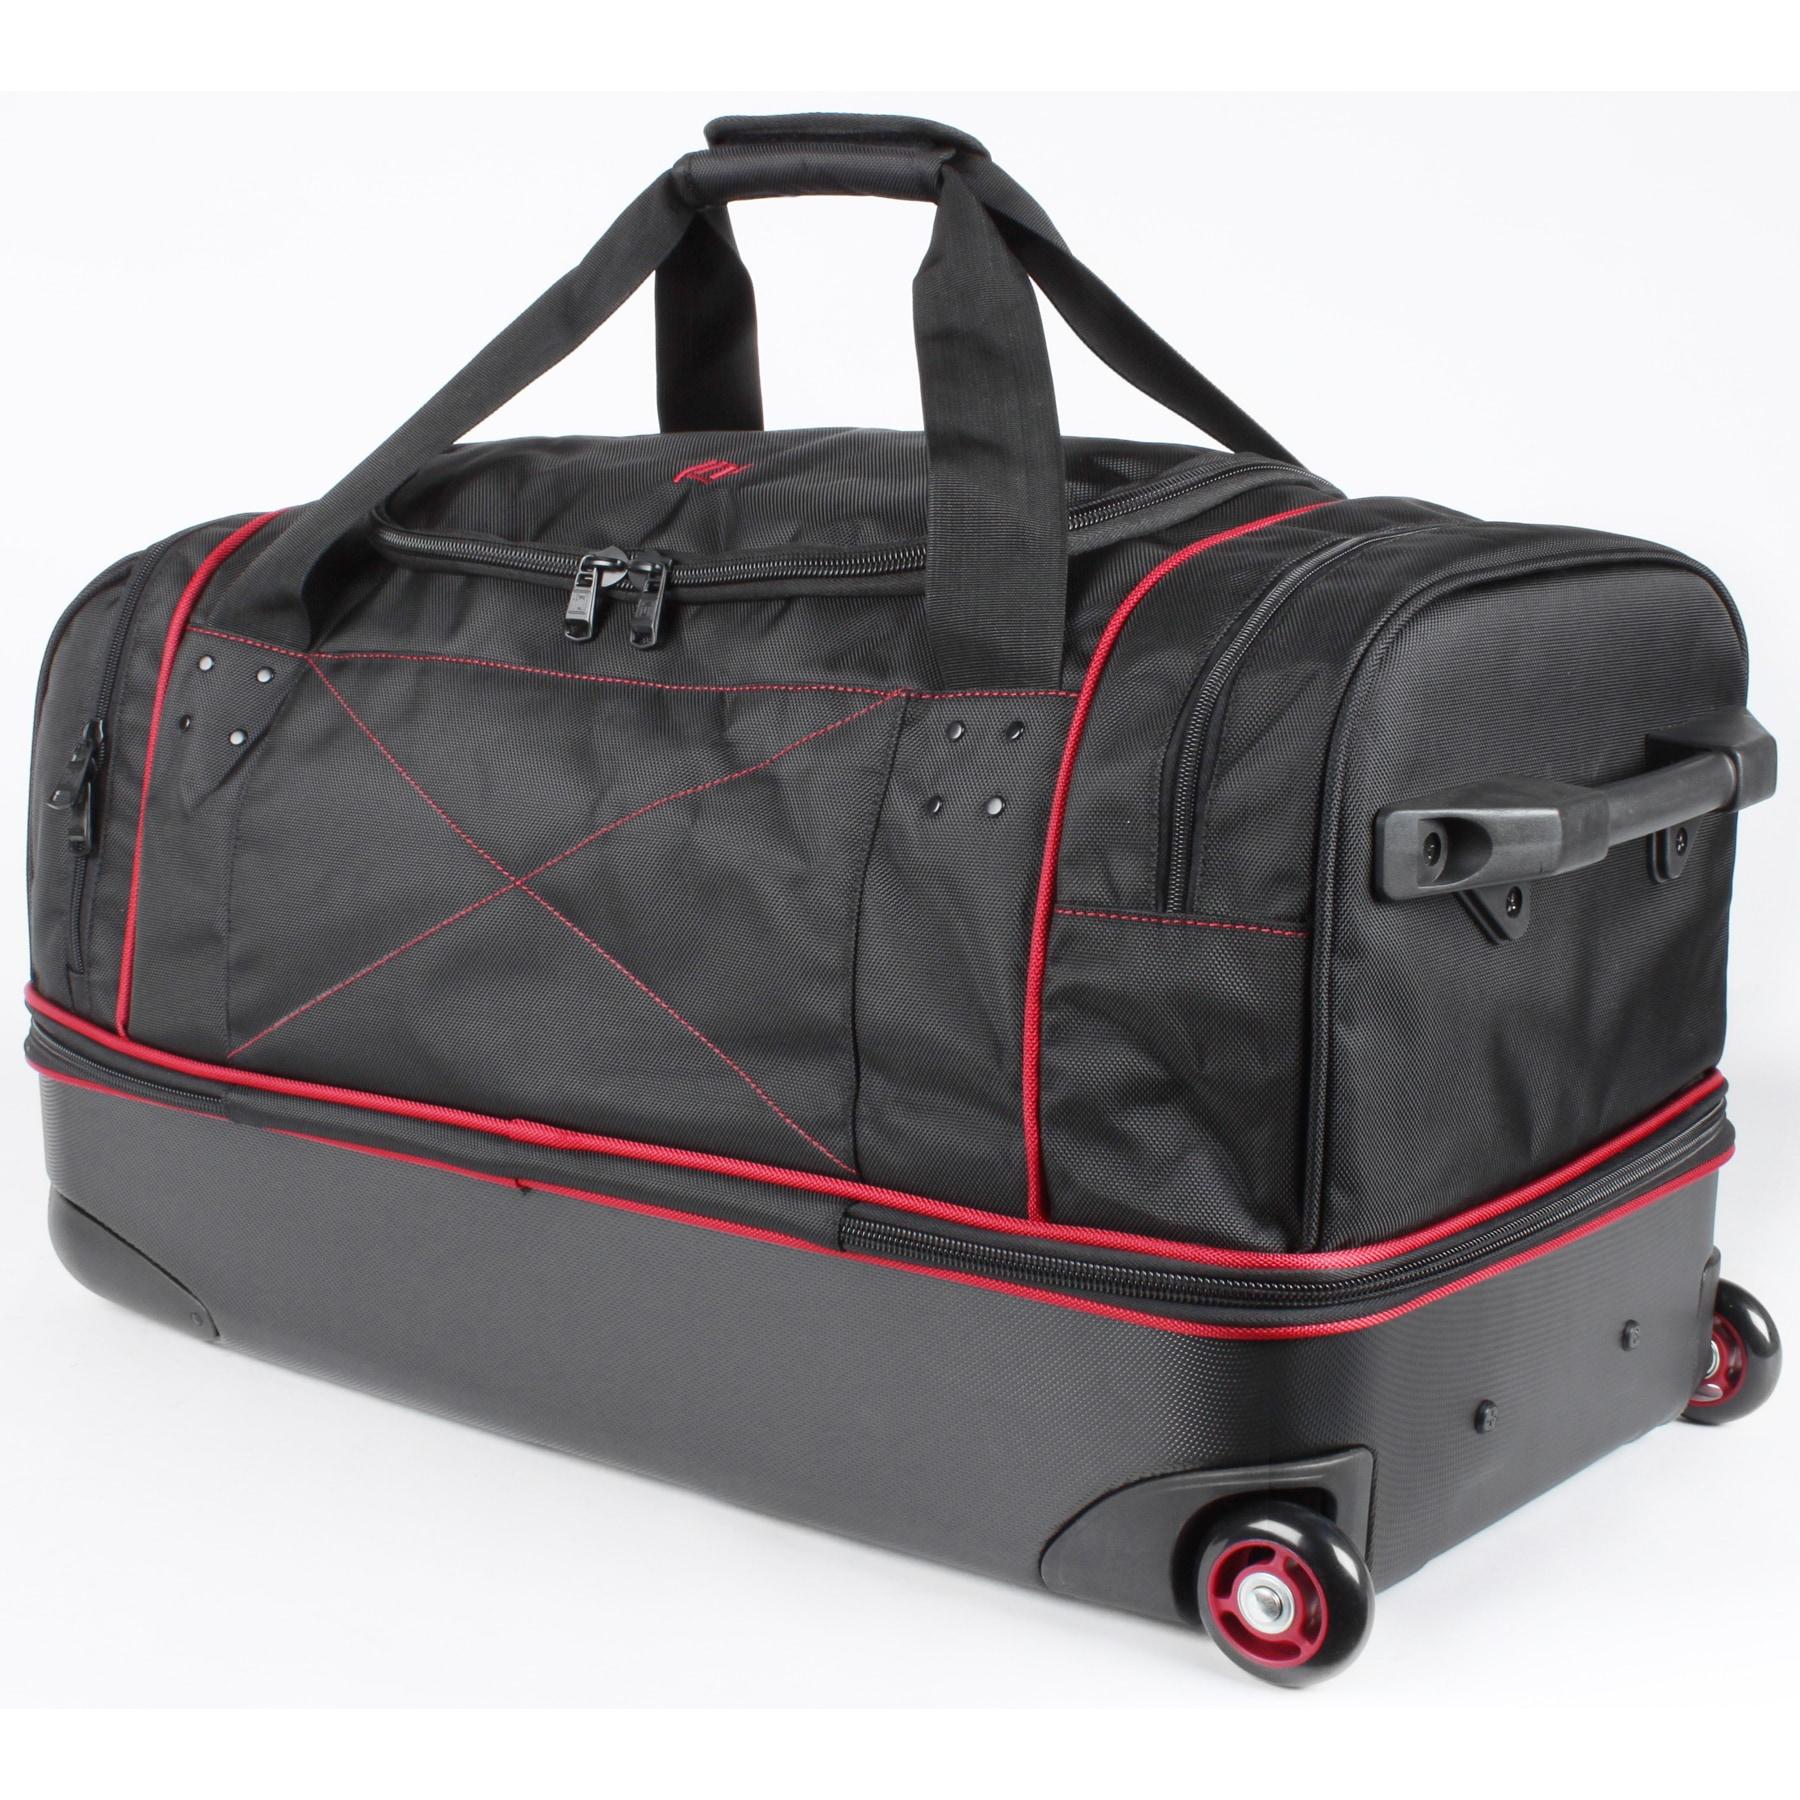 Ful Hybrid 28 Inch Drop Bottom Rolling Duffel Bag Free Shipping Today 10808021